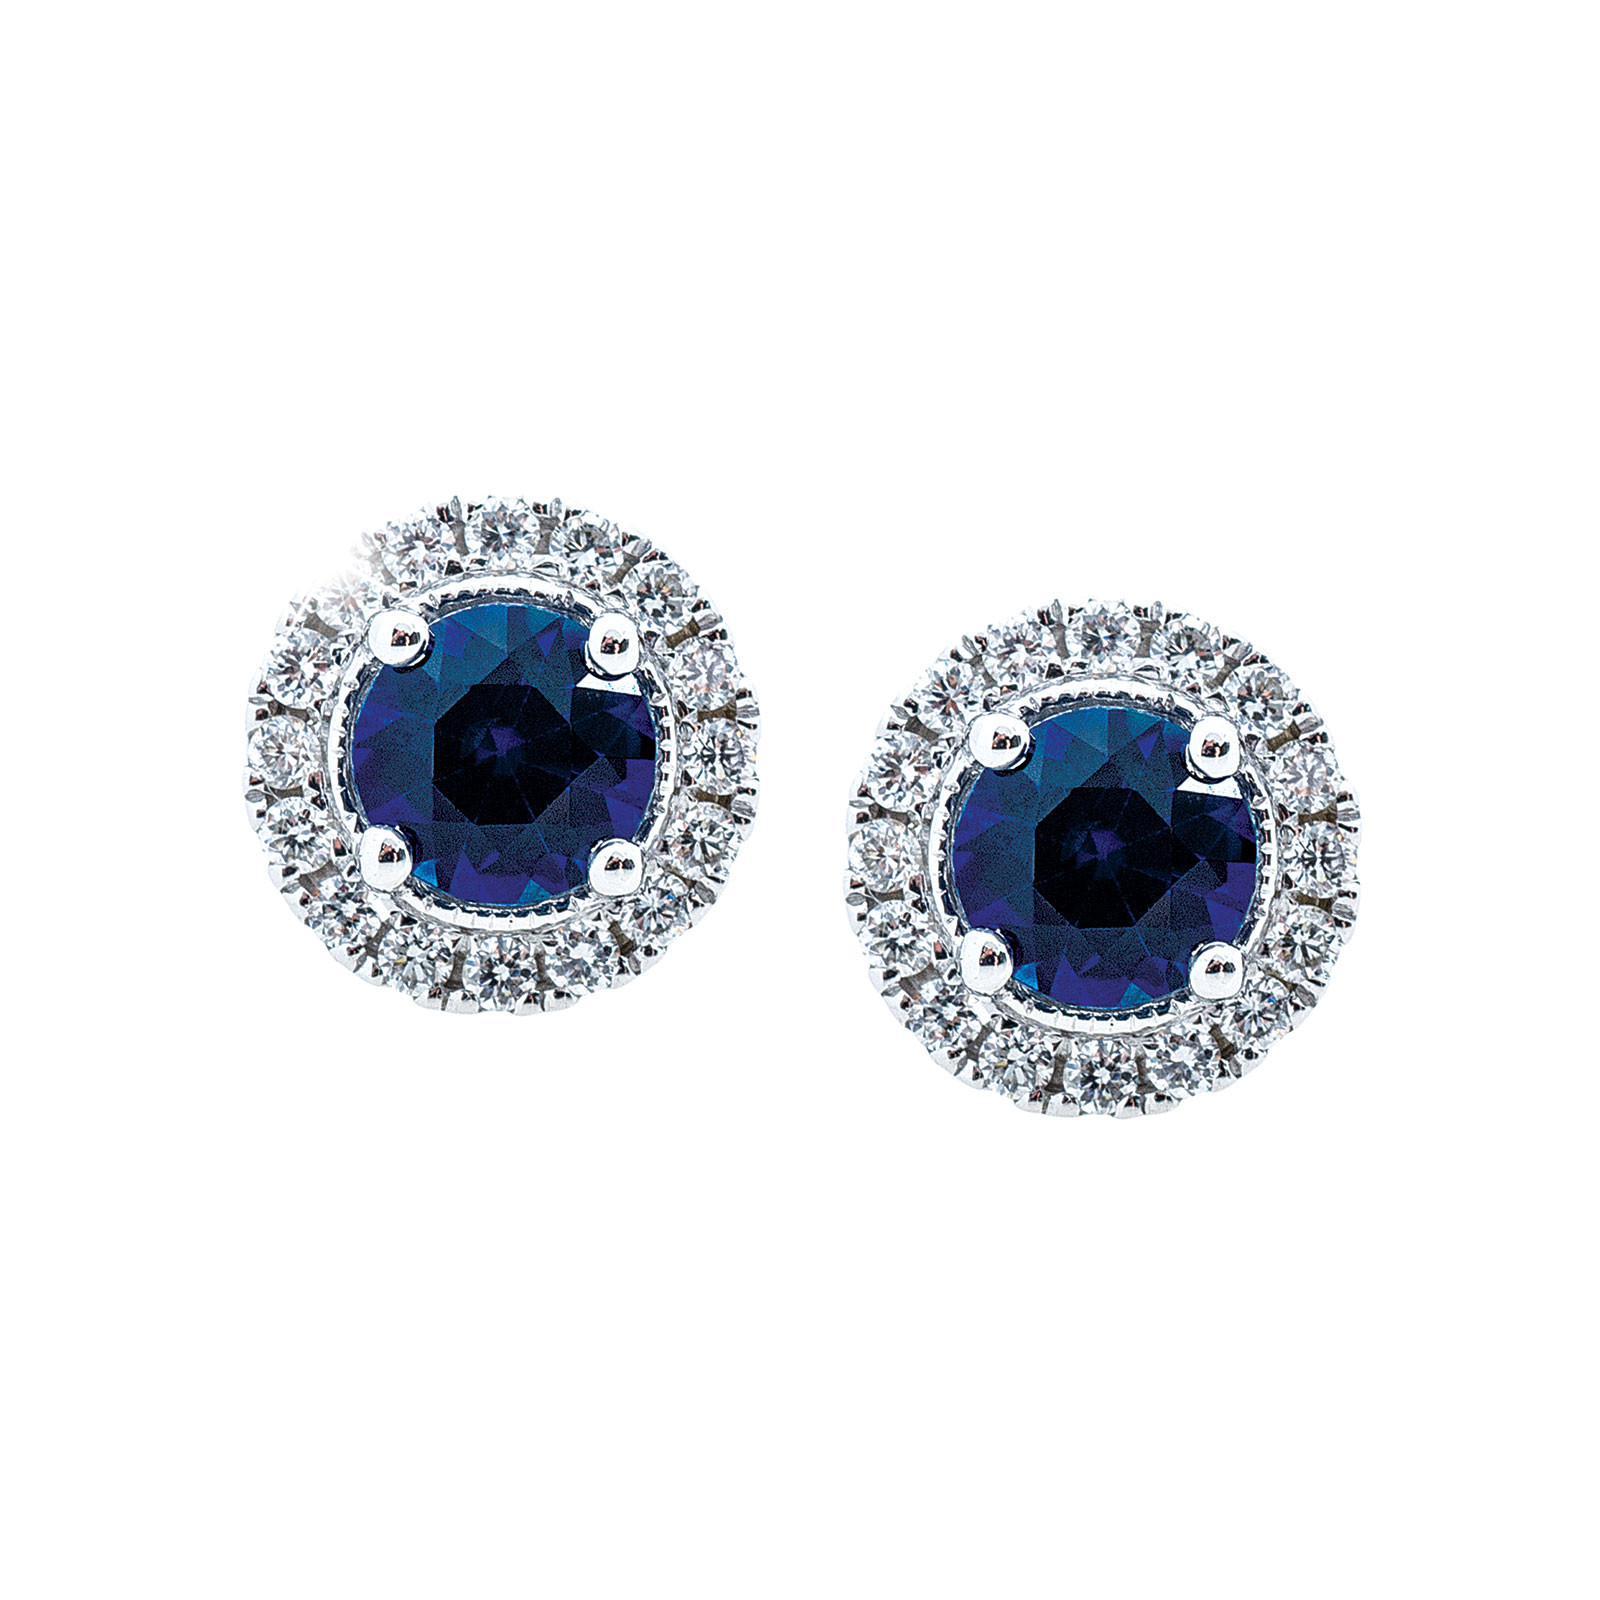 New 0.78 CTW Blue Sapphire & Diamond Stud Earrings